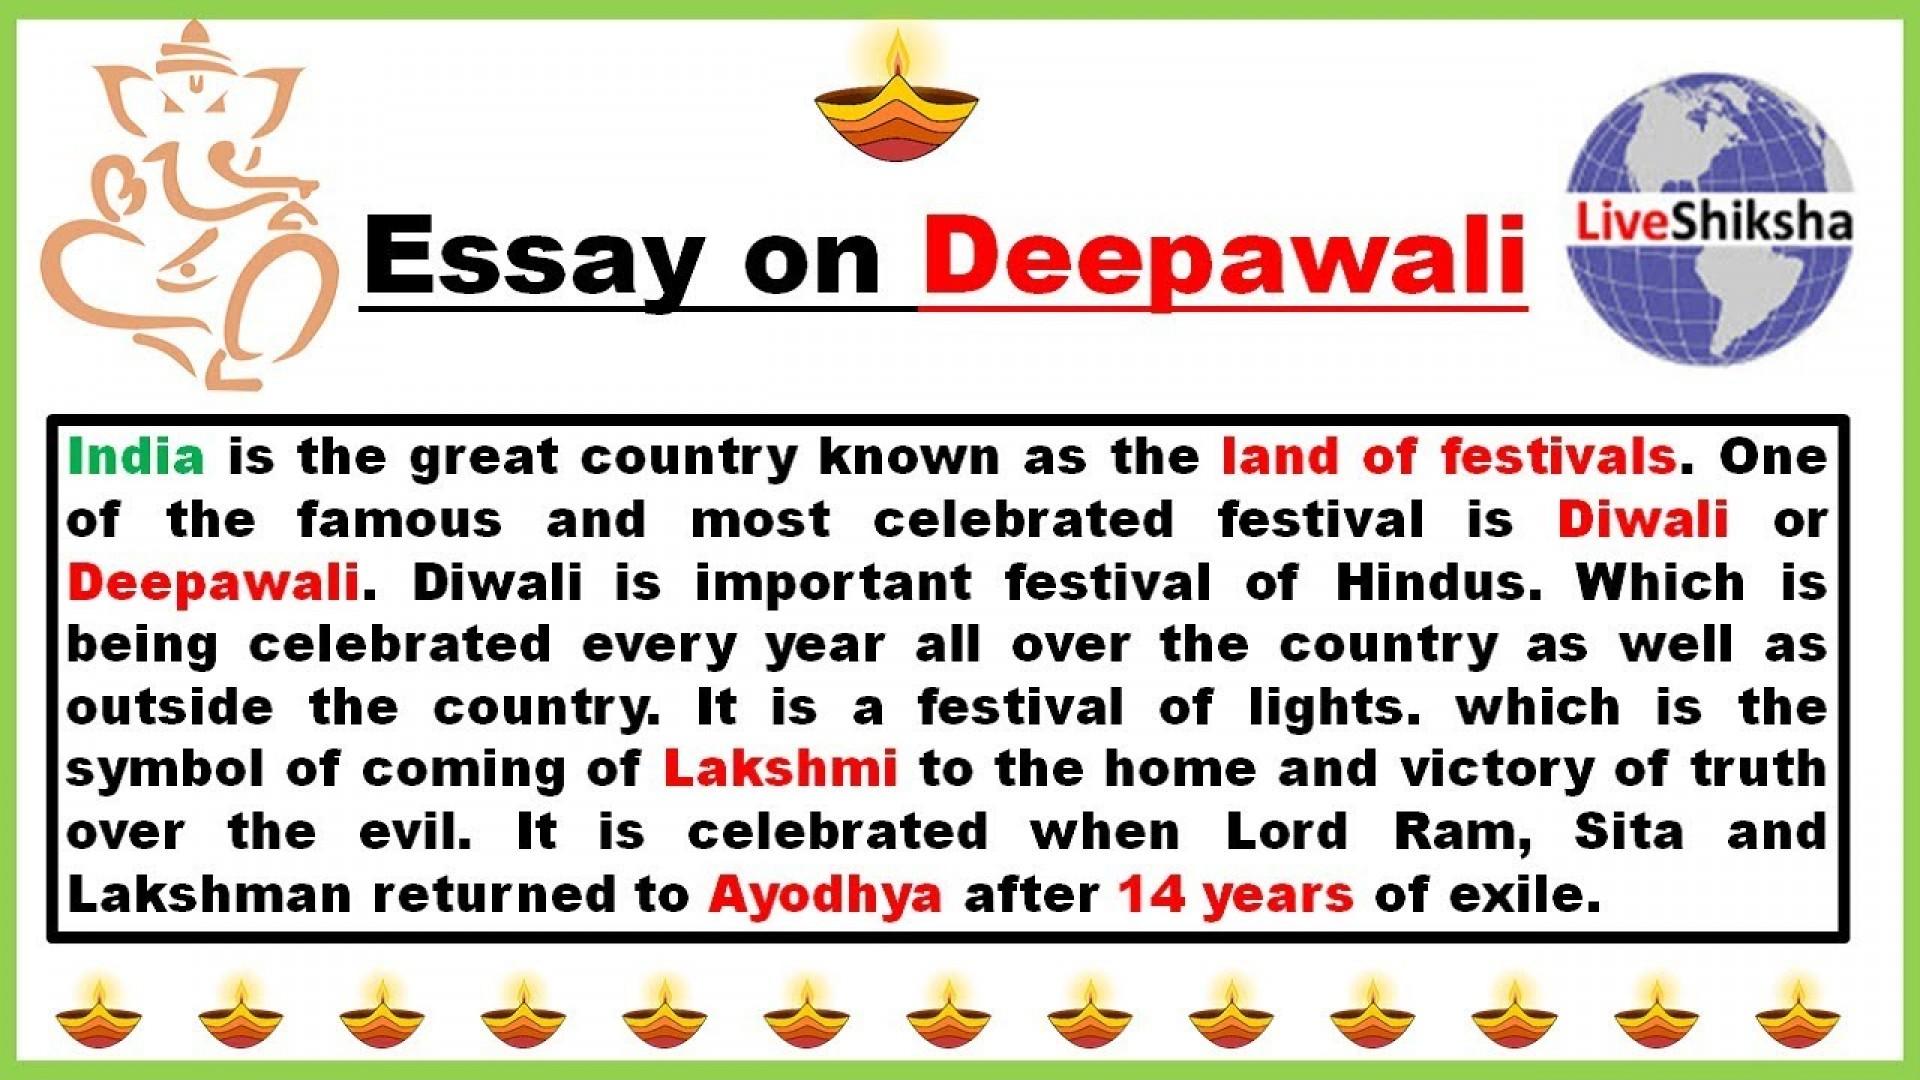 020 Maxresdefault Essay For Diwali In Hindi Fantastic On 50 Words Class Short 3 1920